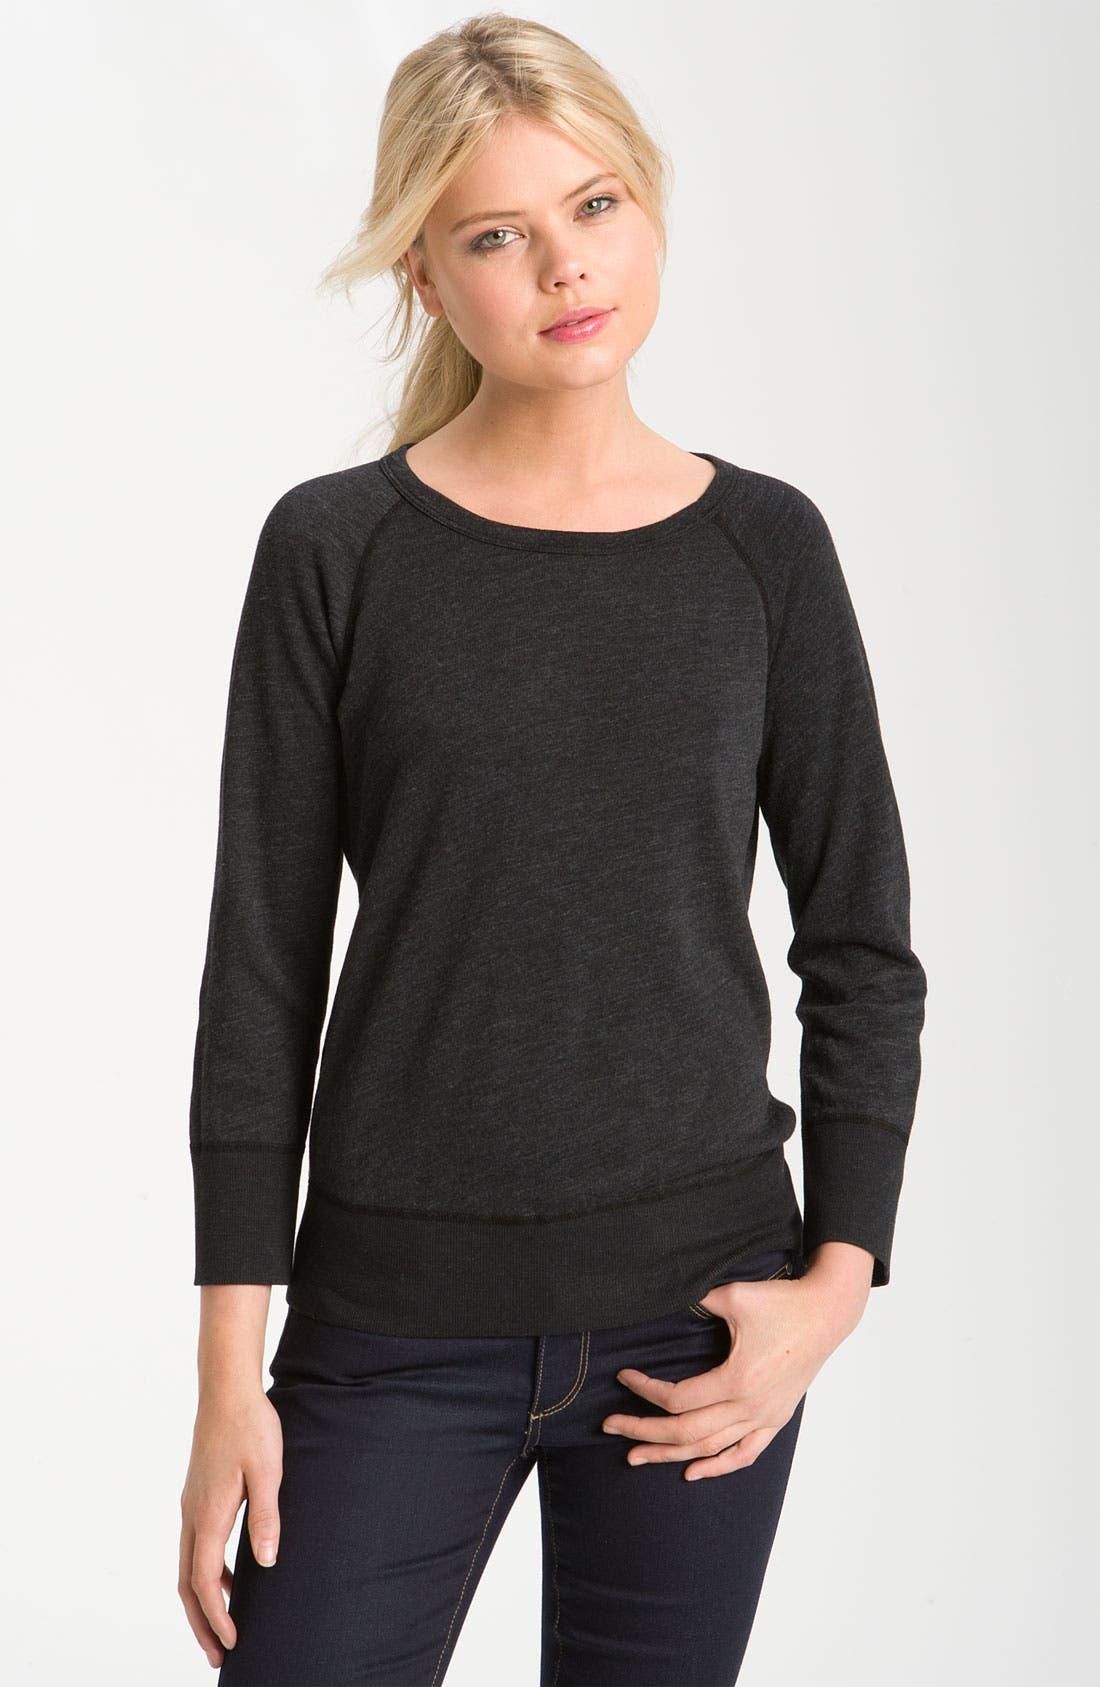 Alternate Image 1 Selected - Hudson Jeans & James Perse Sweatshirt